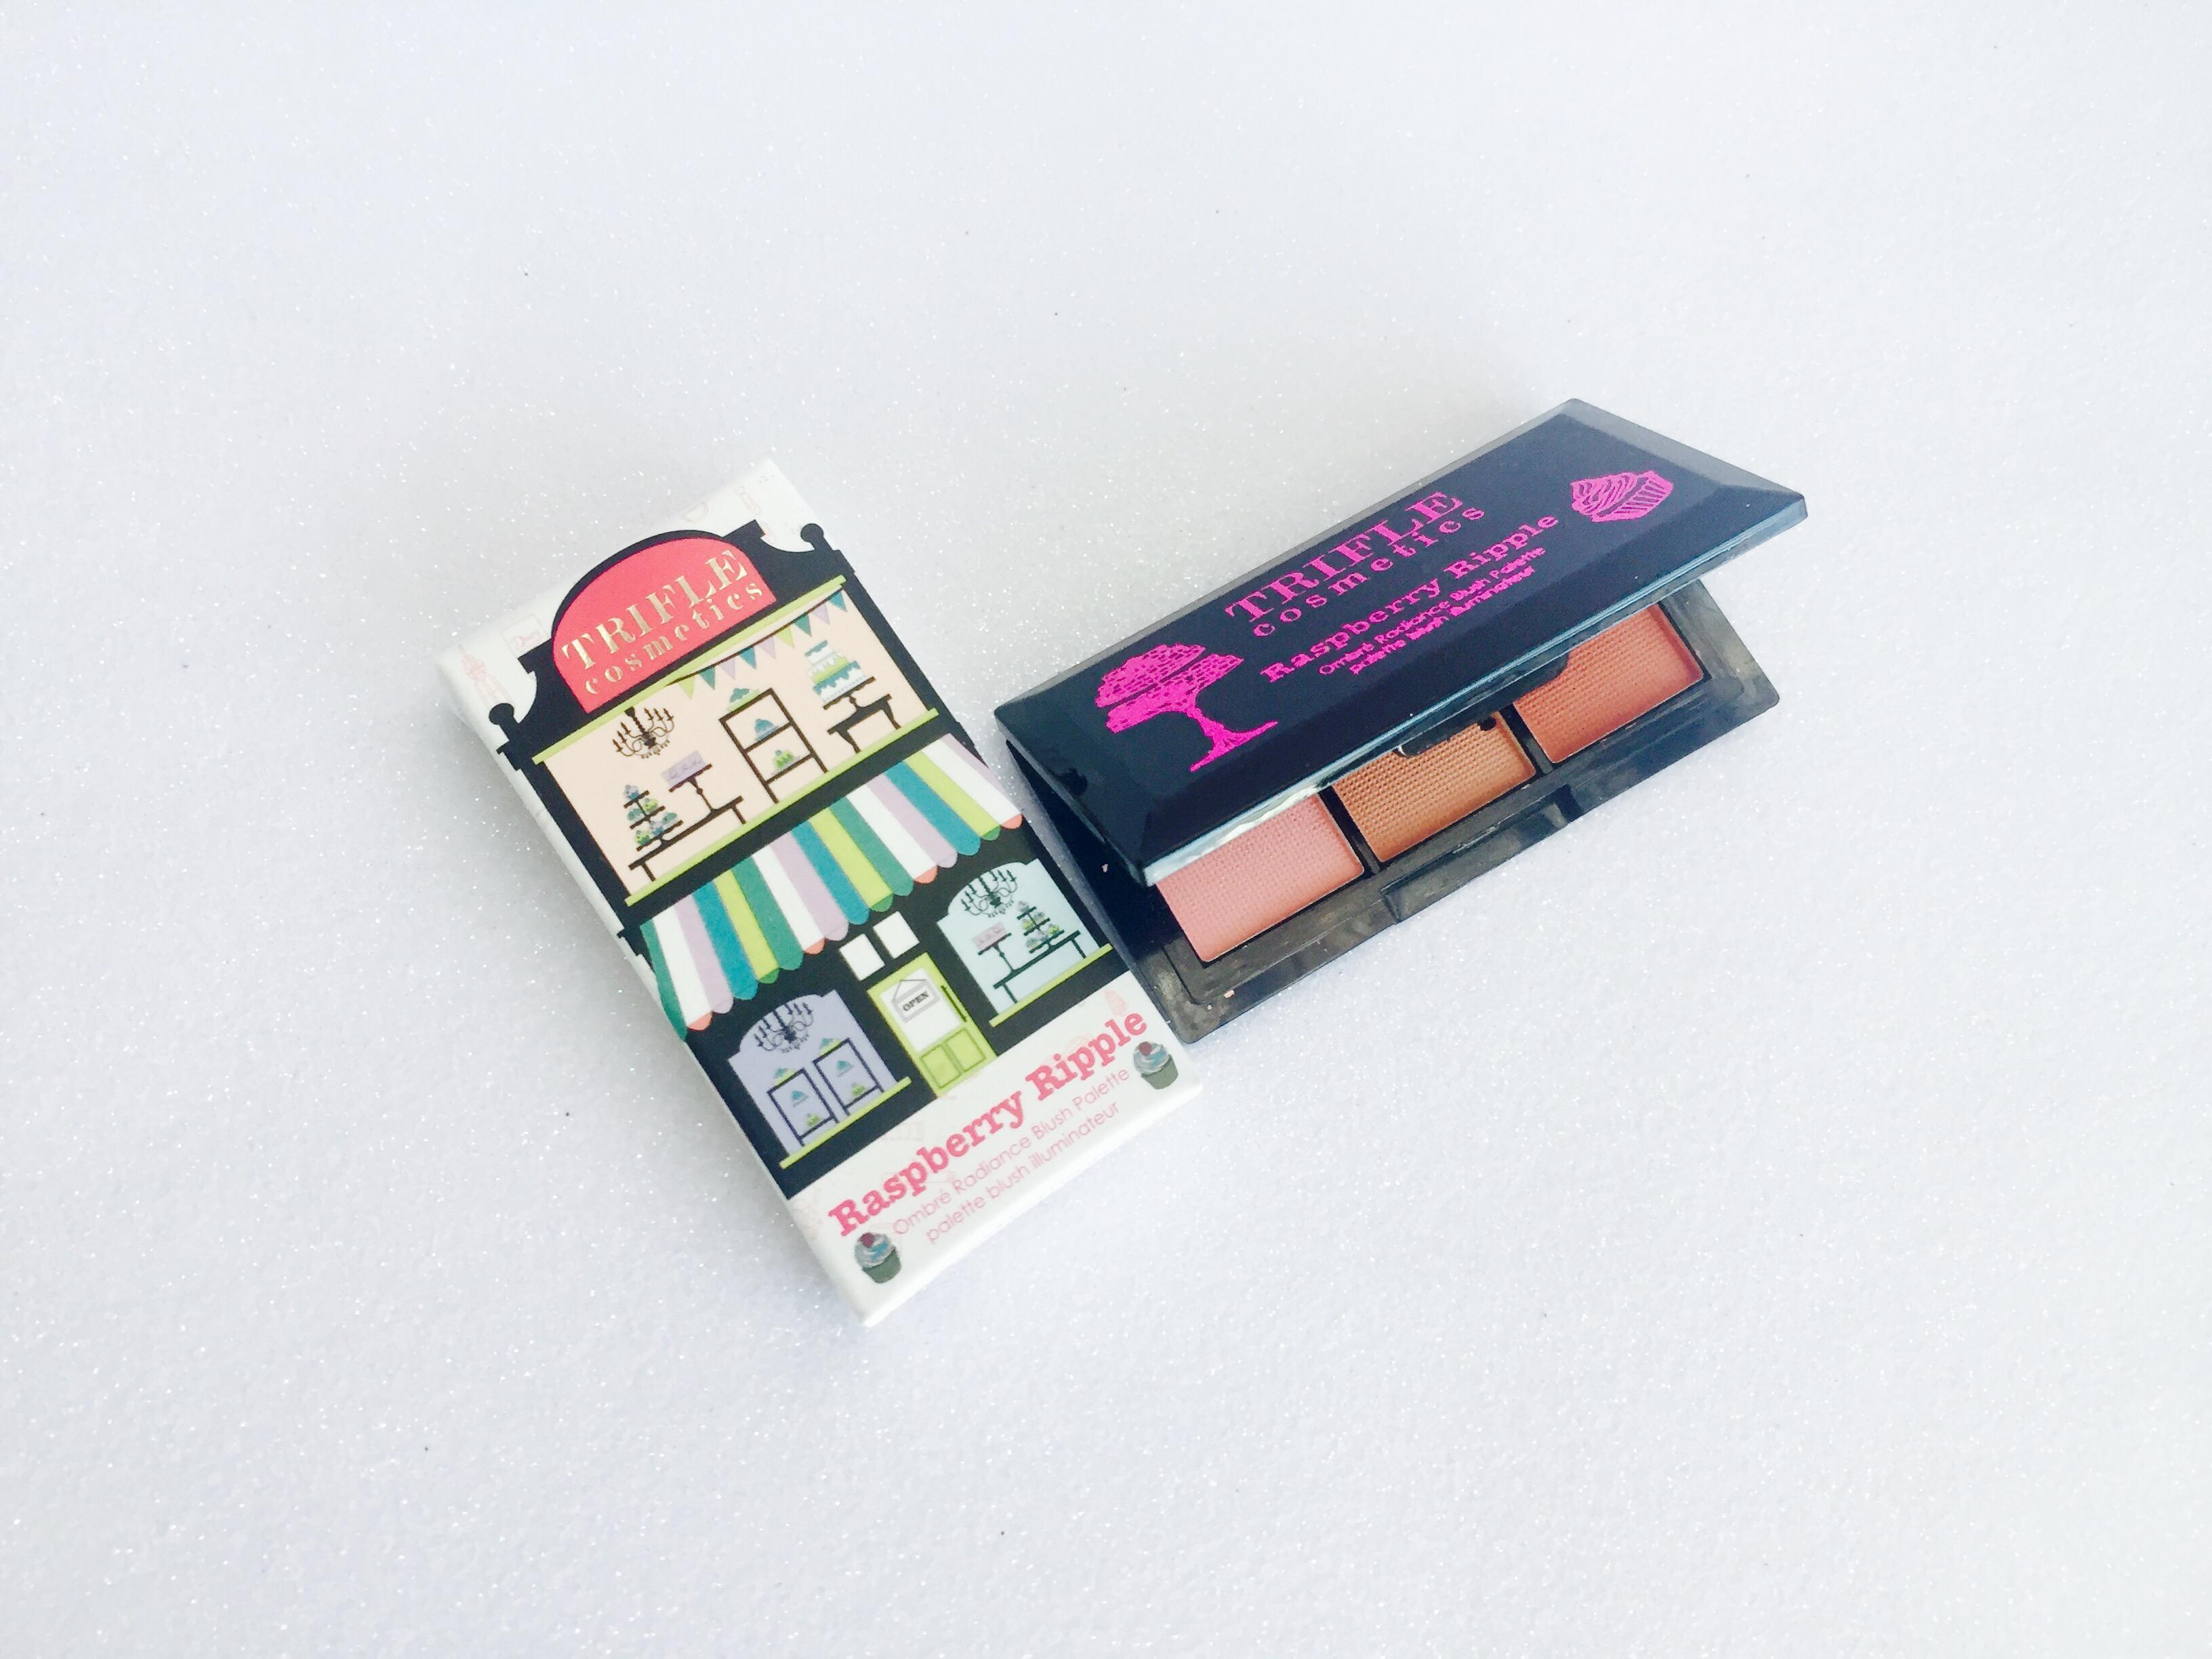 Trifle Cosmetics Raspberry Ripple - Ombré Radiance Blush Palette